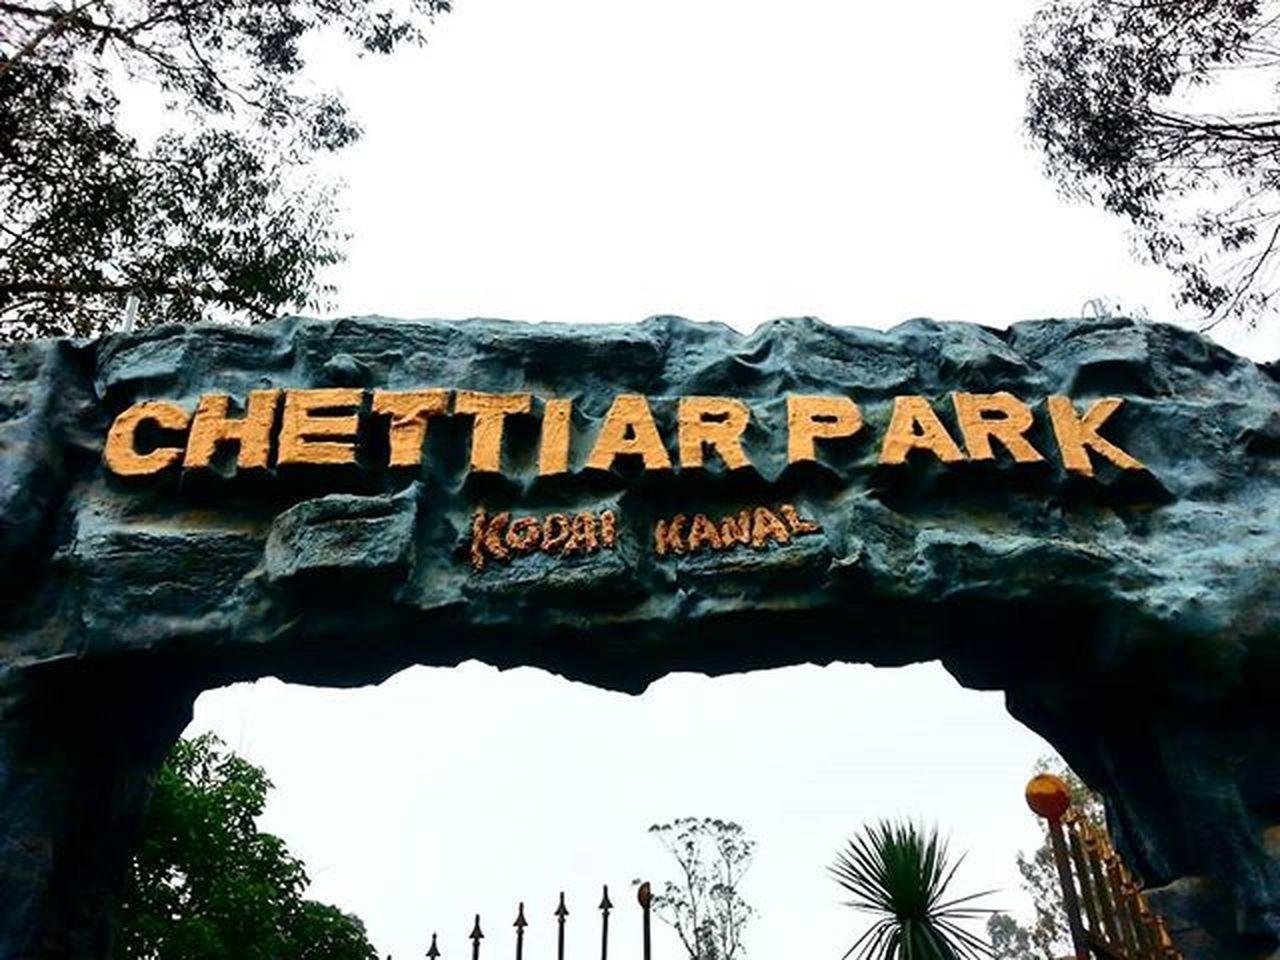 Chettiar park 😍 Chettiarpark Park Kodaikanal India South Southindia _soi Instatravel Travel Tamilnadu Traveljournal Pixelpanda_india Incredibleindia Picturesofindia Beautifulindia Hippieinhills Indiatravelgram Desi_diaries Indiaclicks